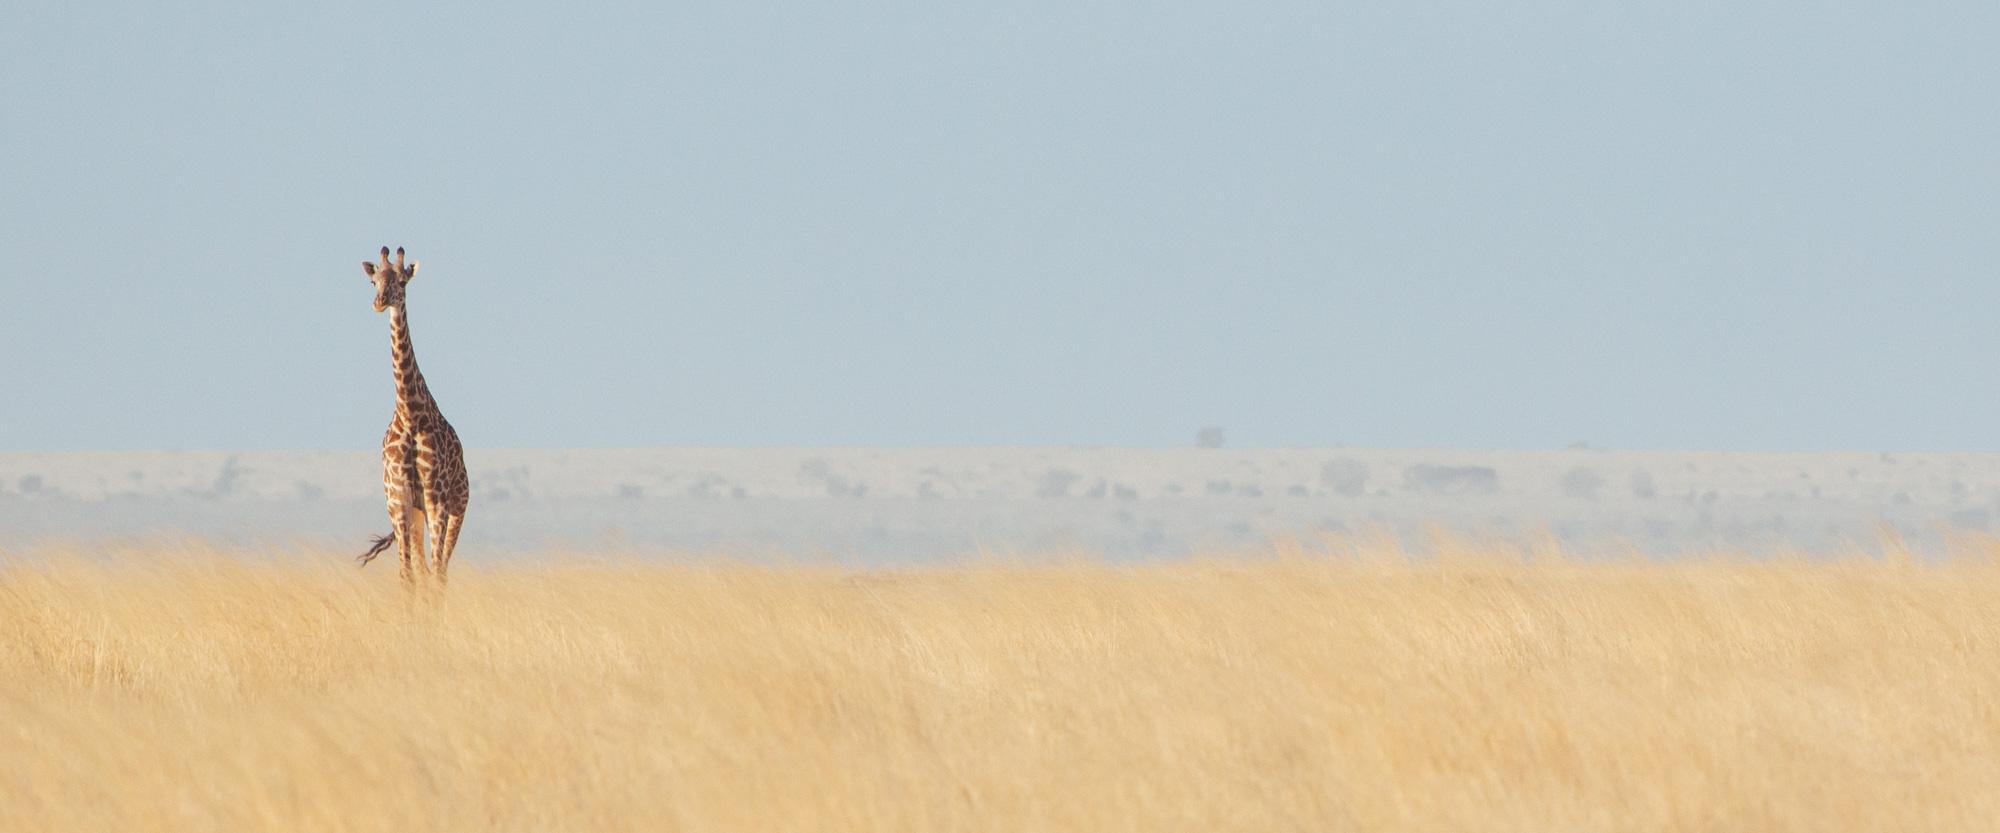 Amboseli Giraffe | Kenya Safari | Panorama